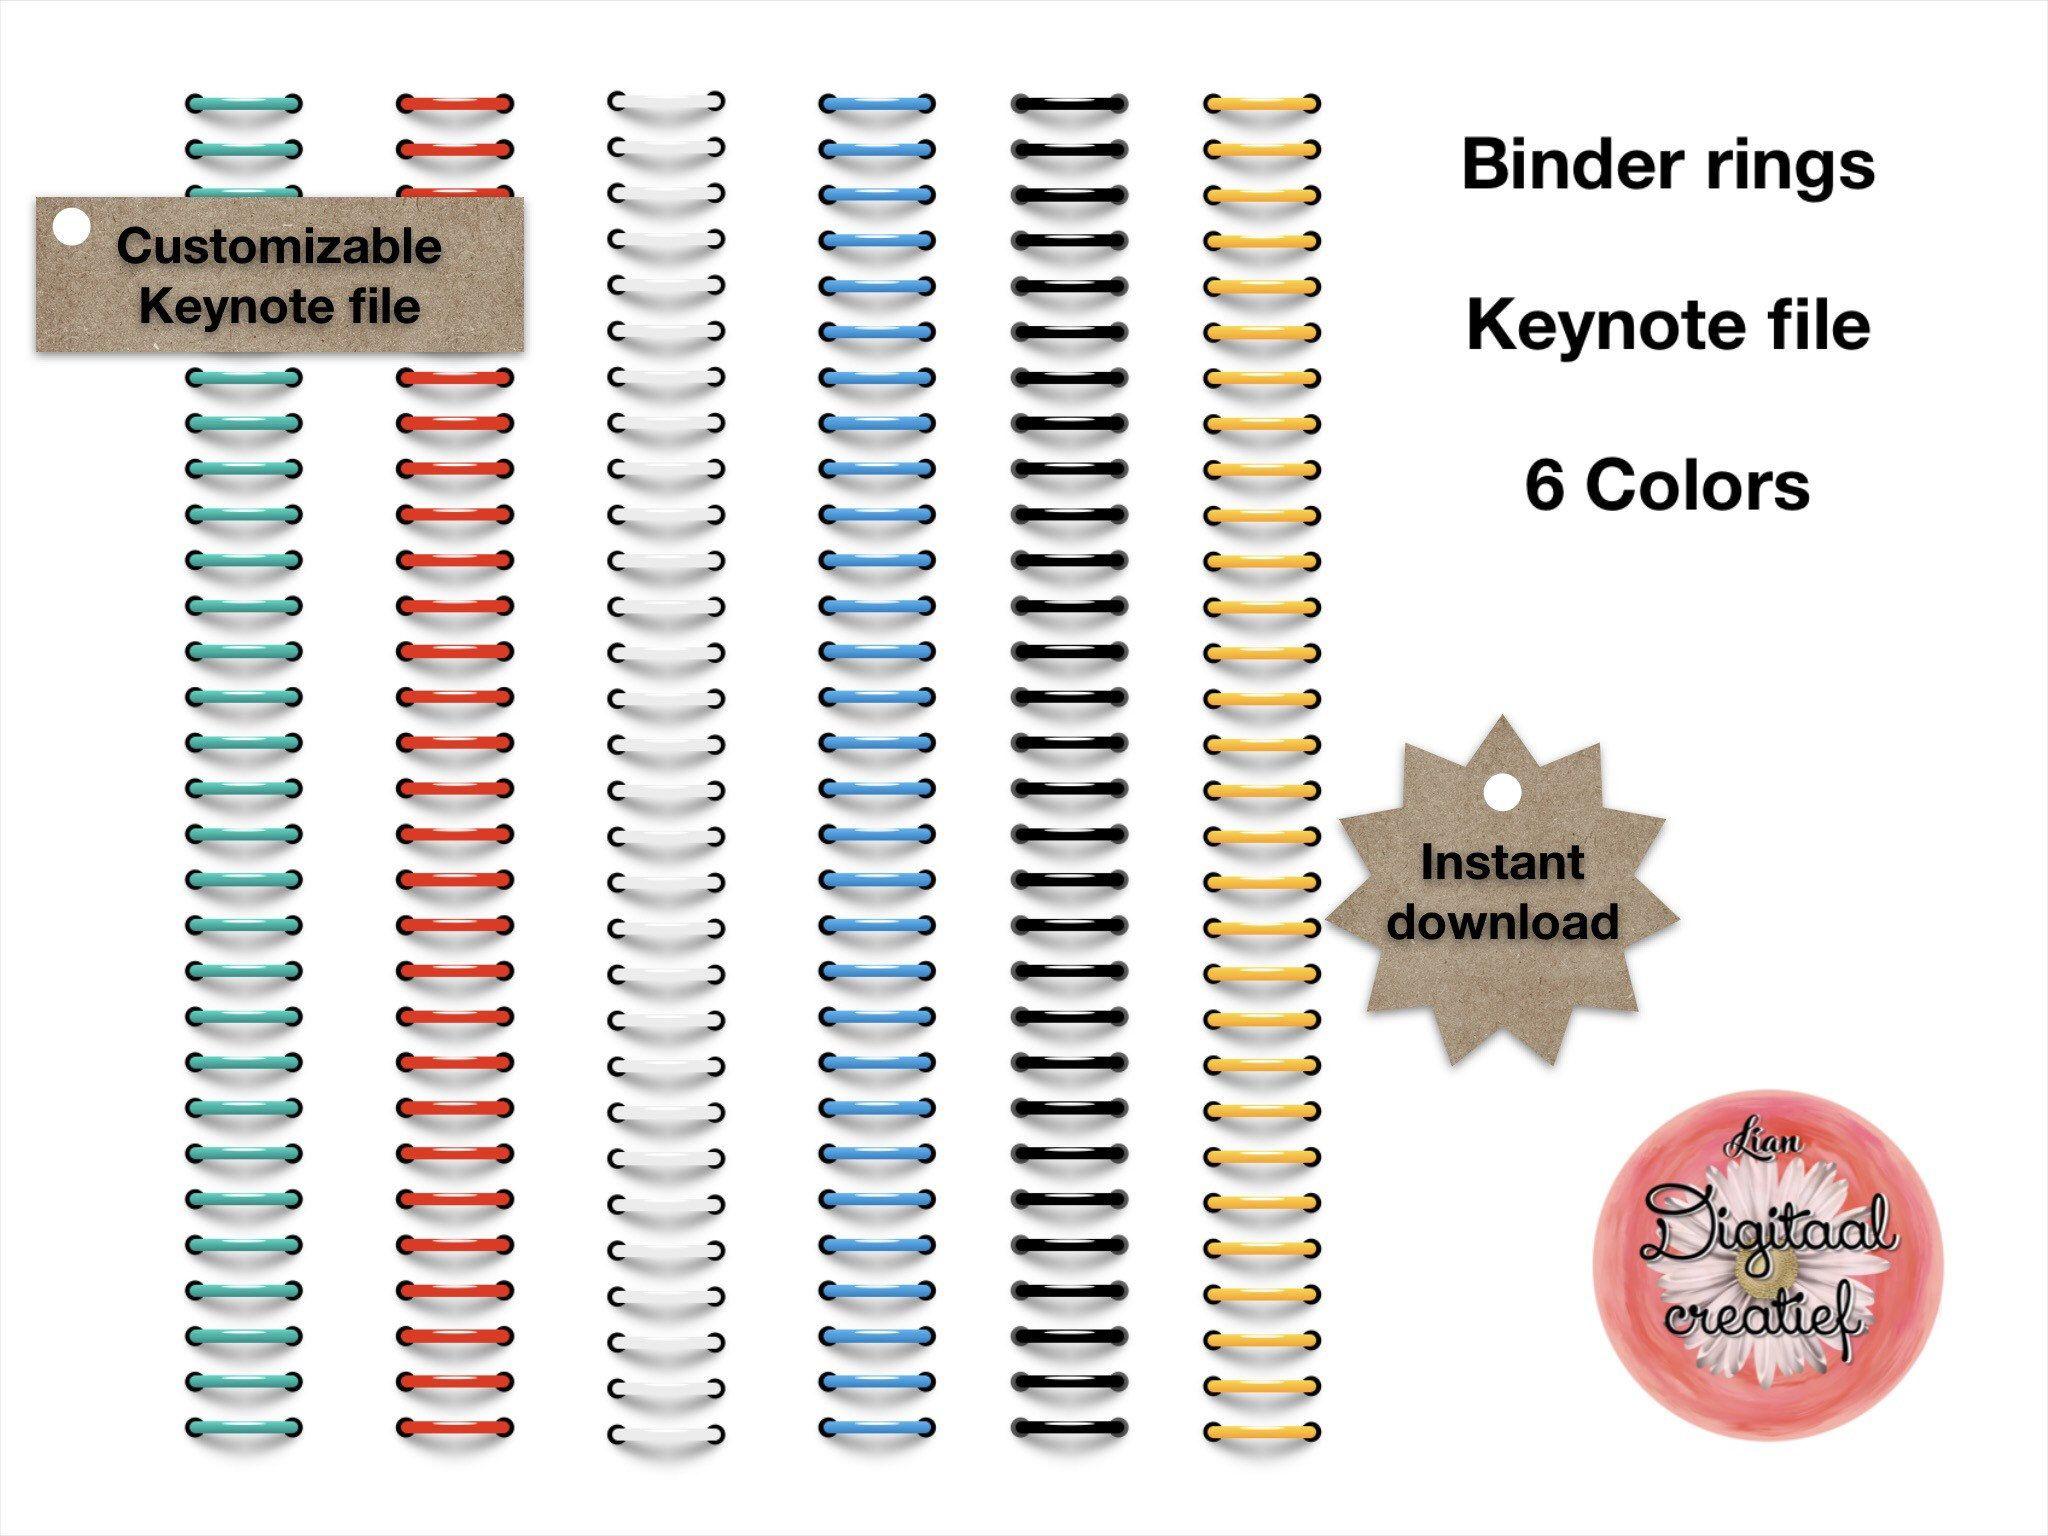 Digital binder rings 6 colors for digital planner or bulletjournal.